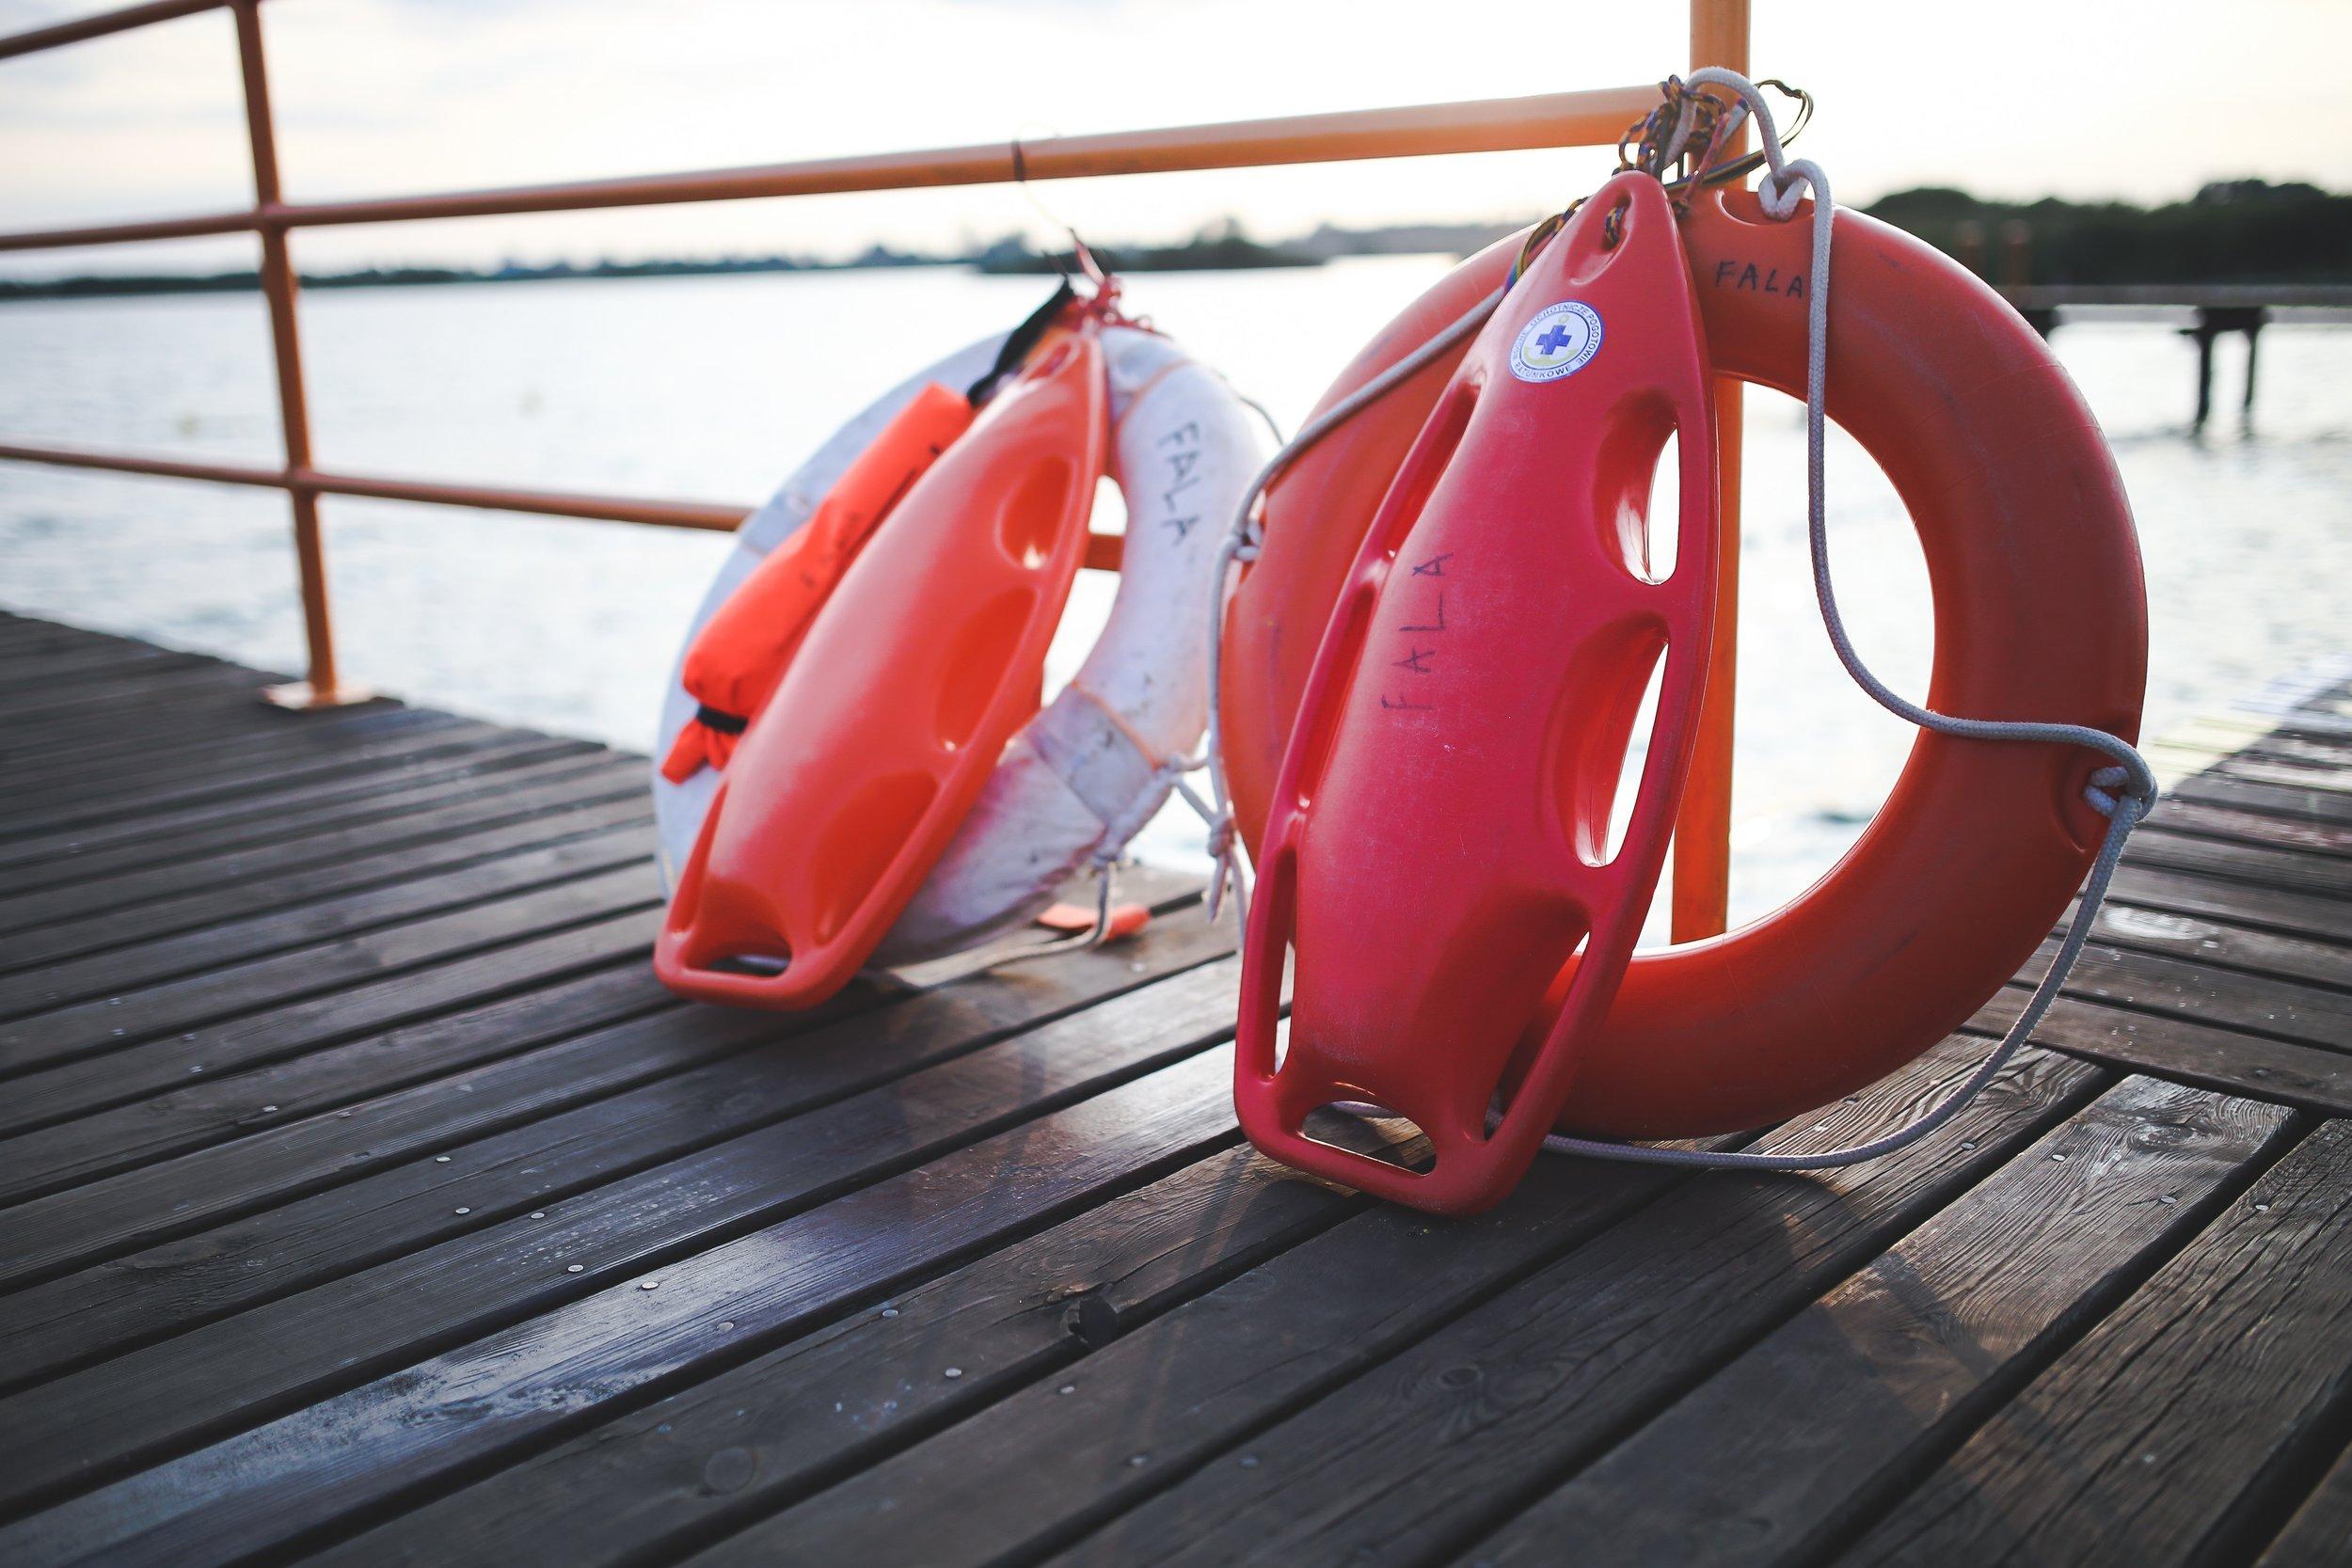 beach-dock-equipment-6127.jpg